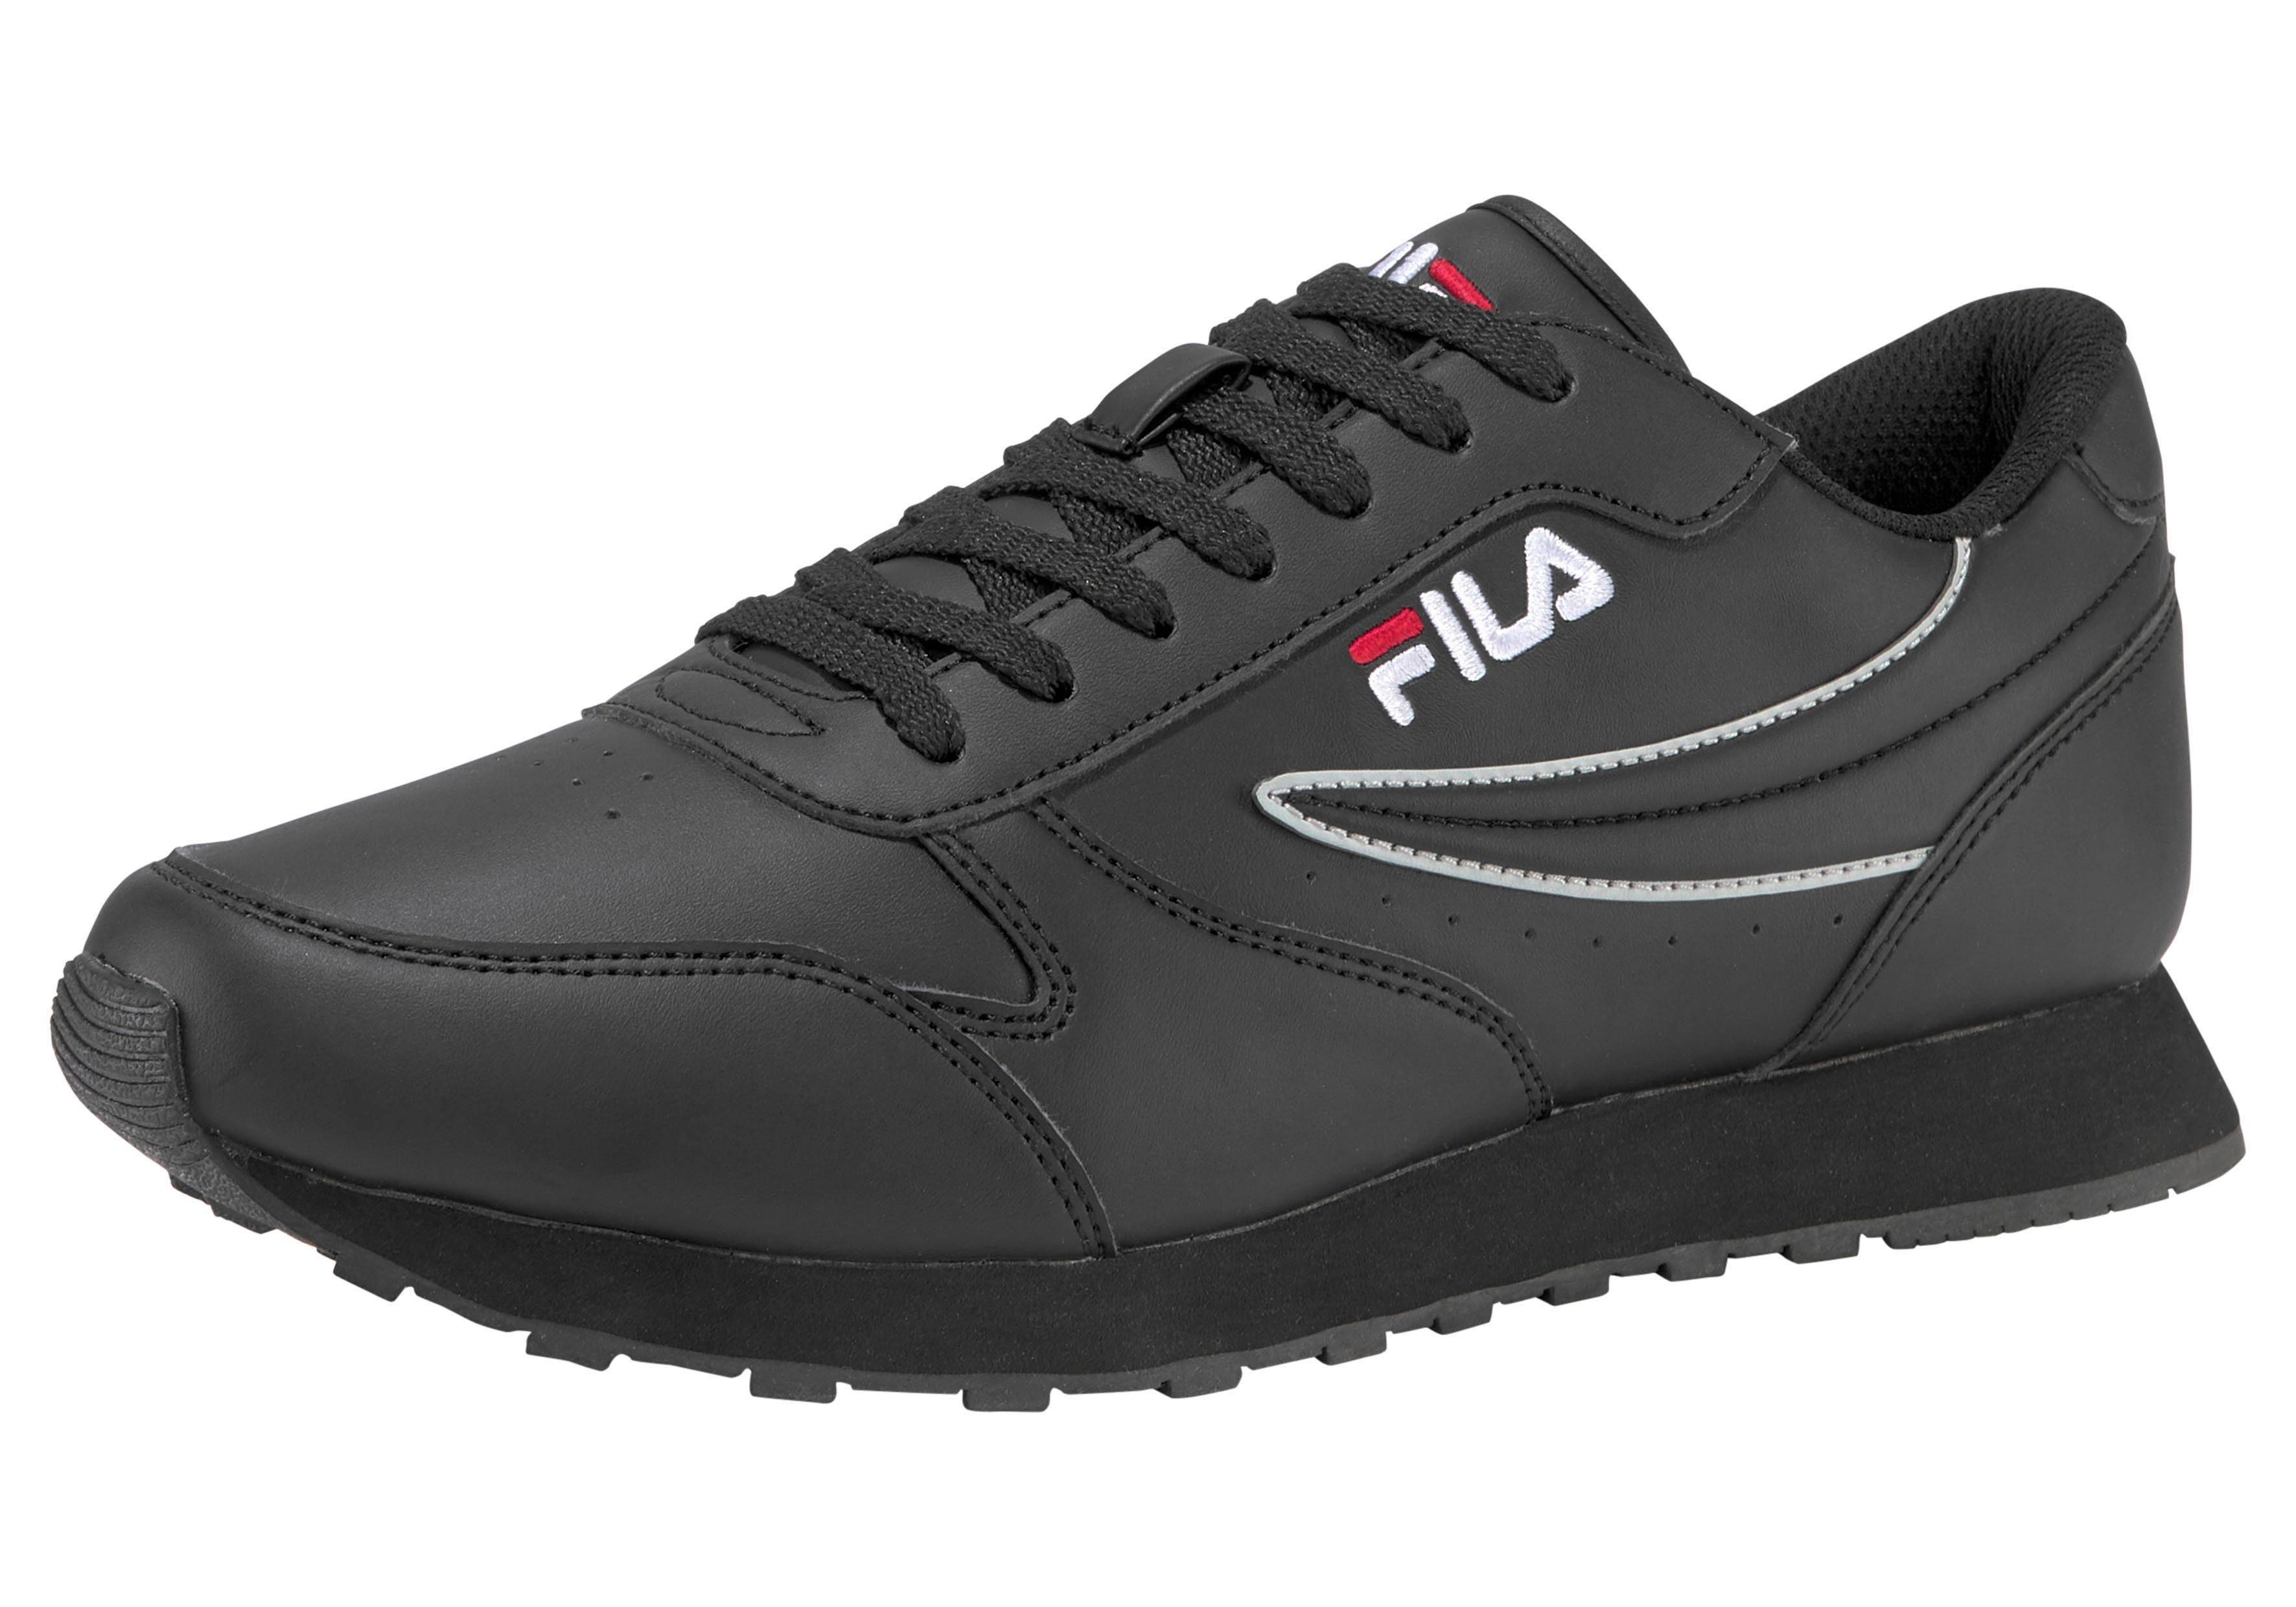 Fila »Orbit Low M« Sneaker, Sportlicher Sneaker von Fila online kaufen   OTTO